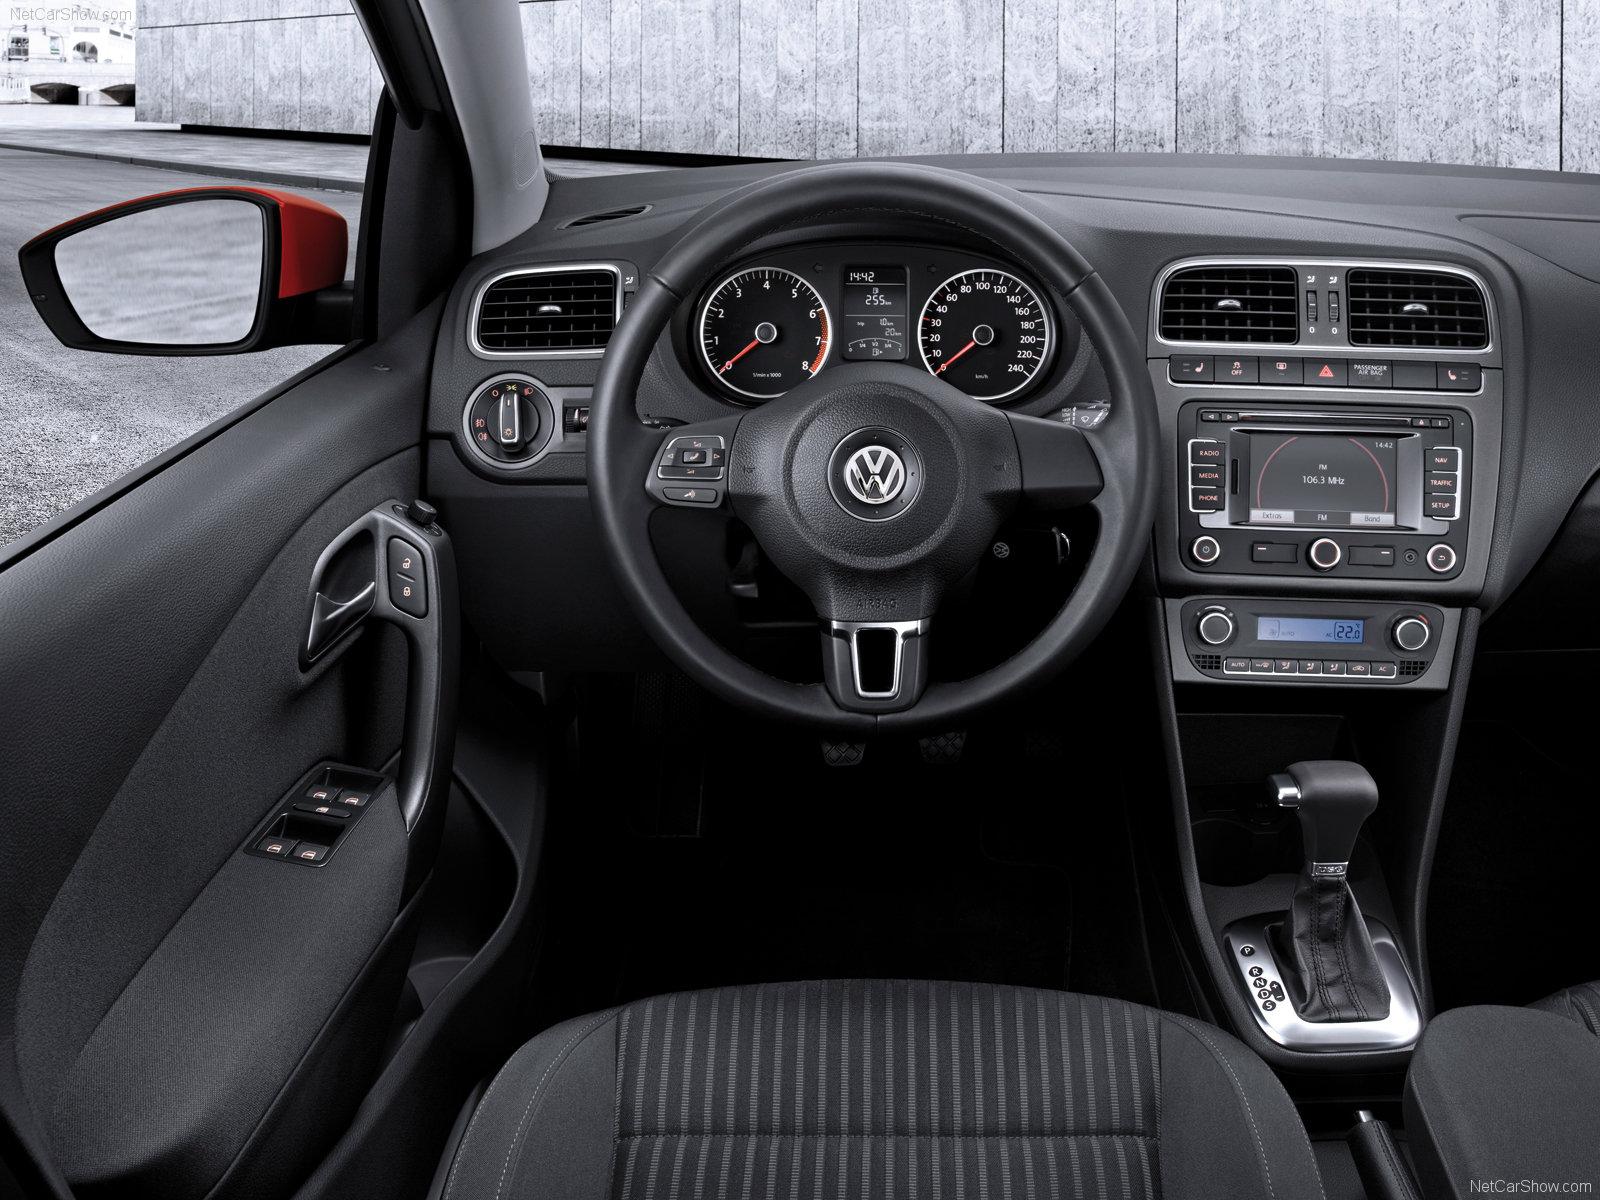 ... glory is forever.: Volkswagen Polo 1.4L DSG vs Fiat Grande Punto 1.4L